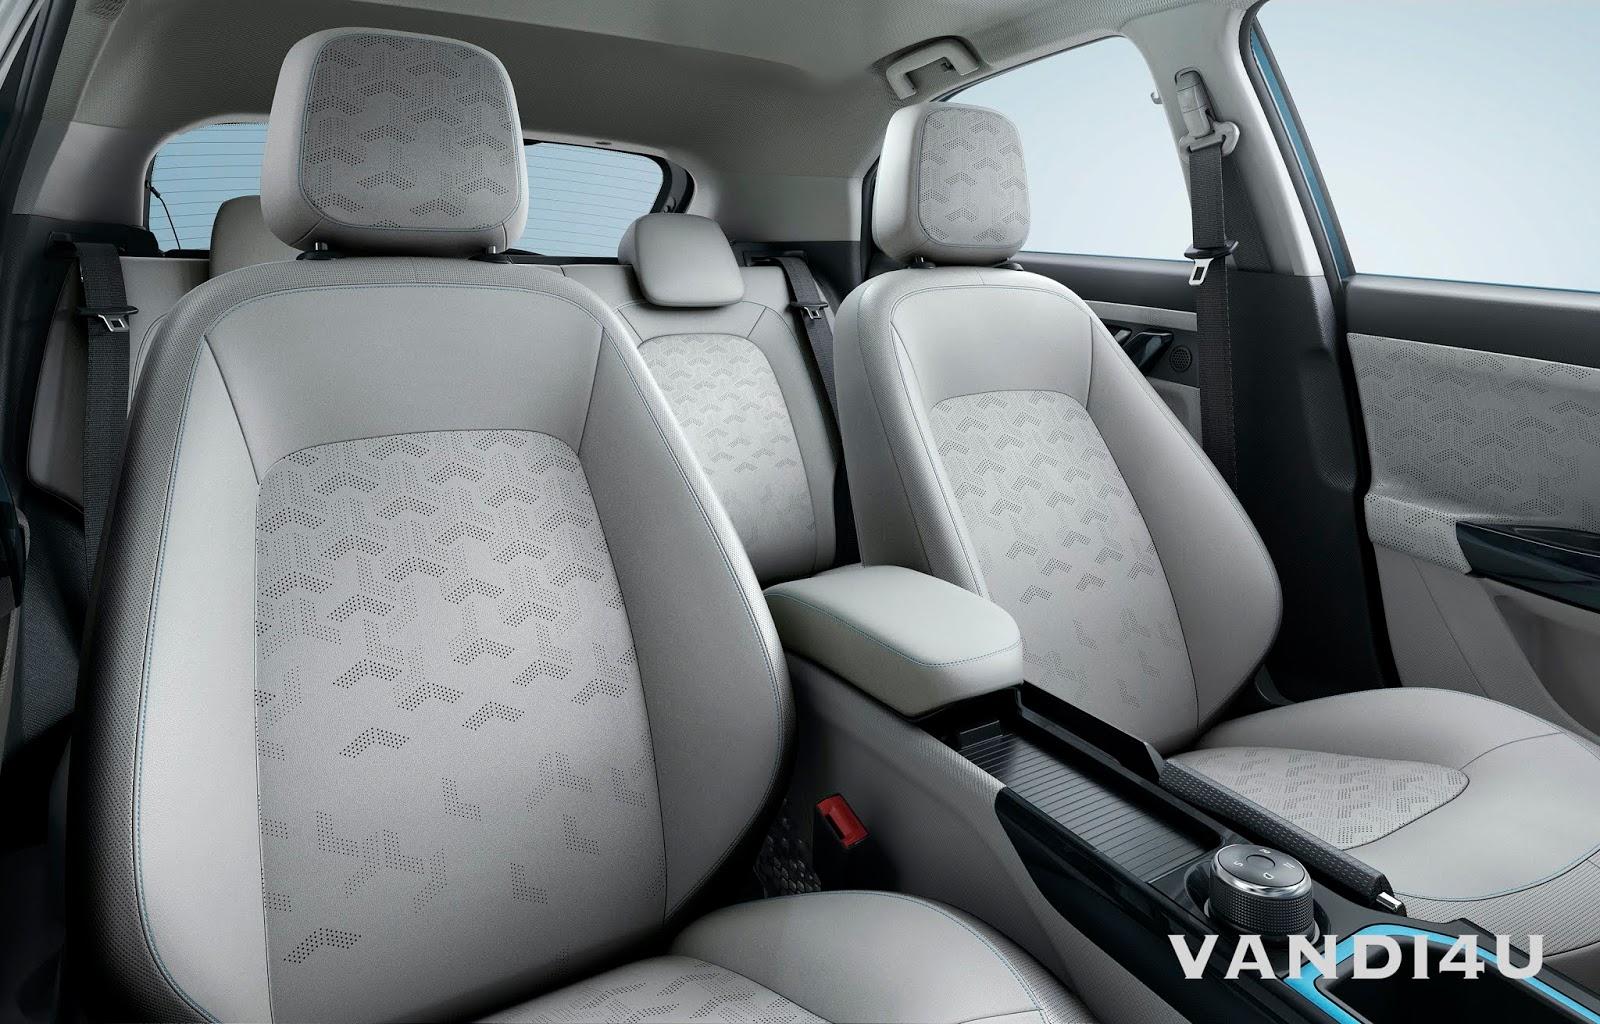 Tata Nexon EV: Top 5 things you need to know   VANDI4U